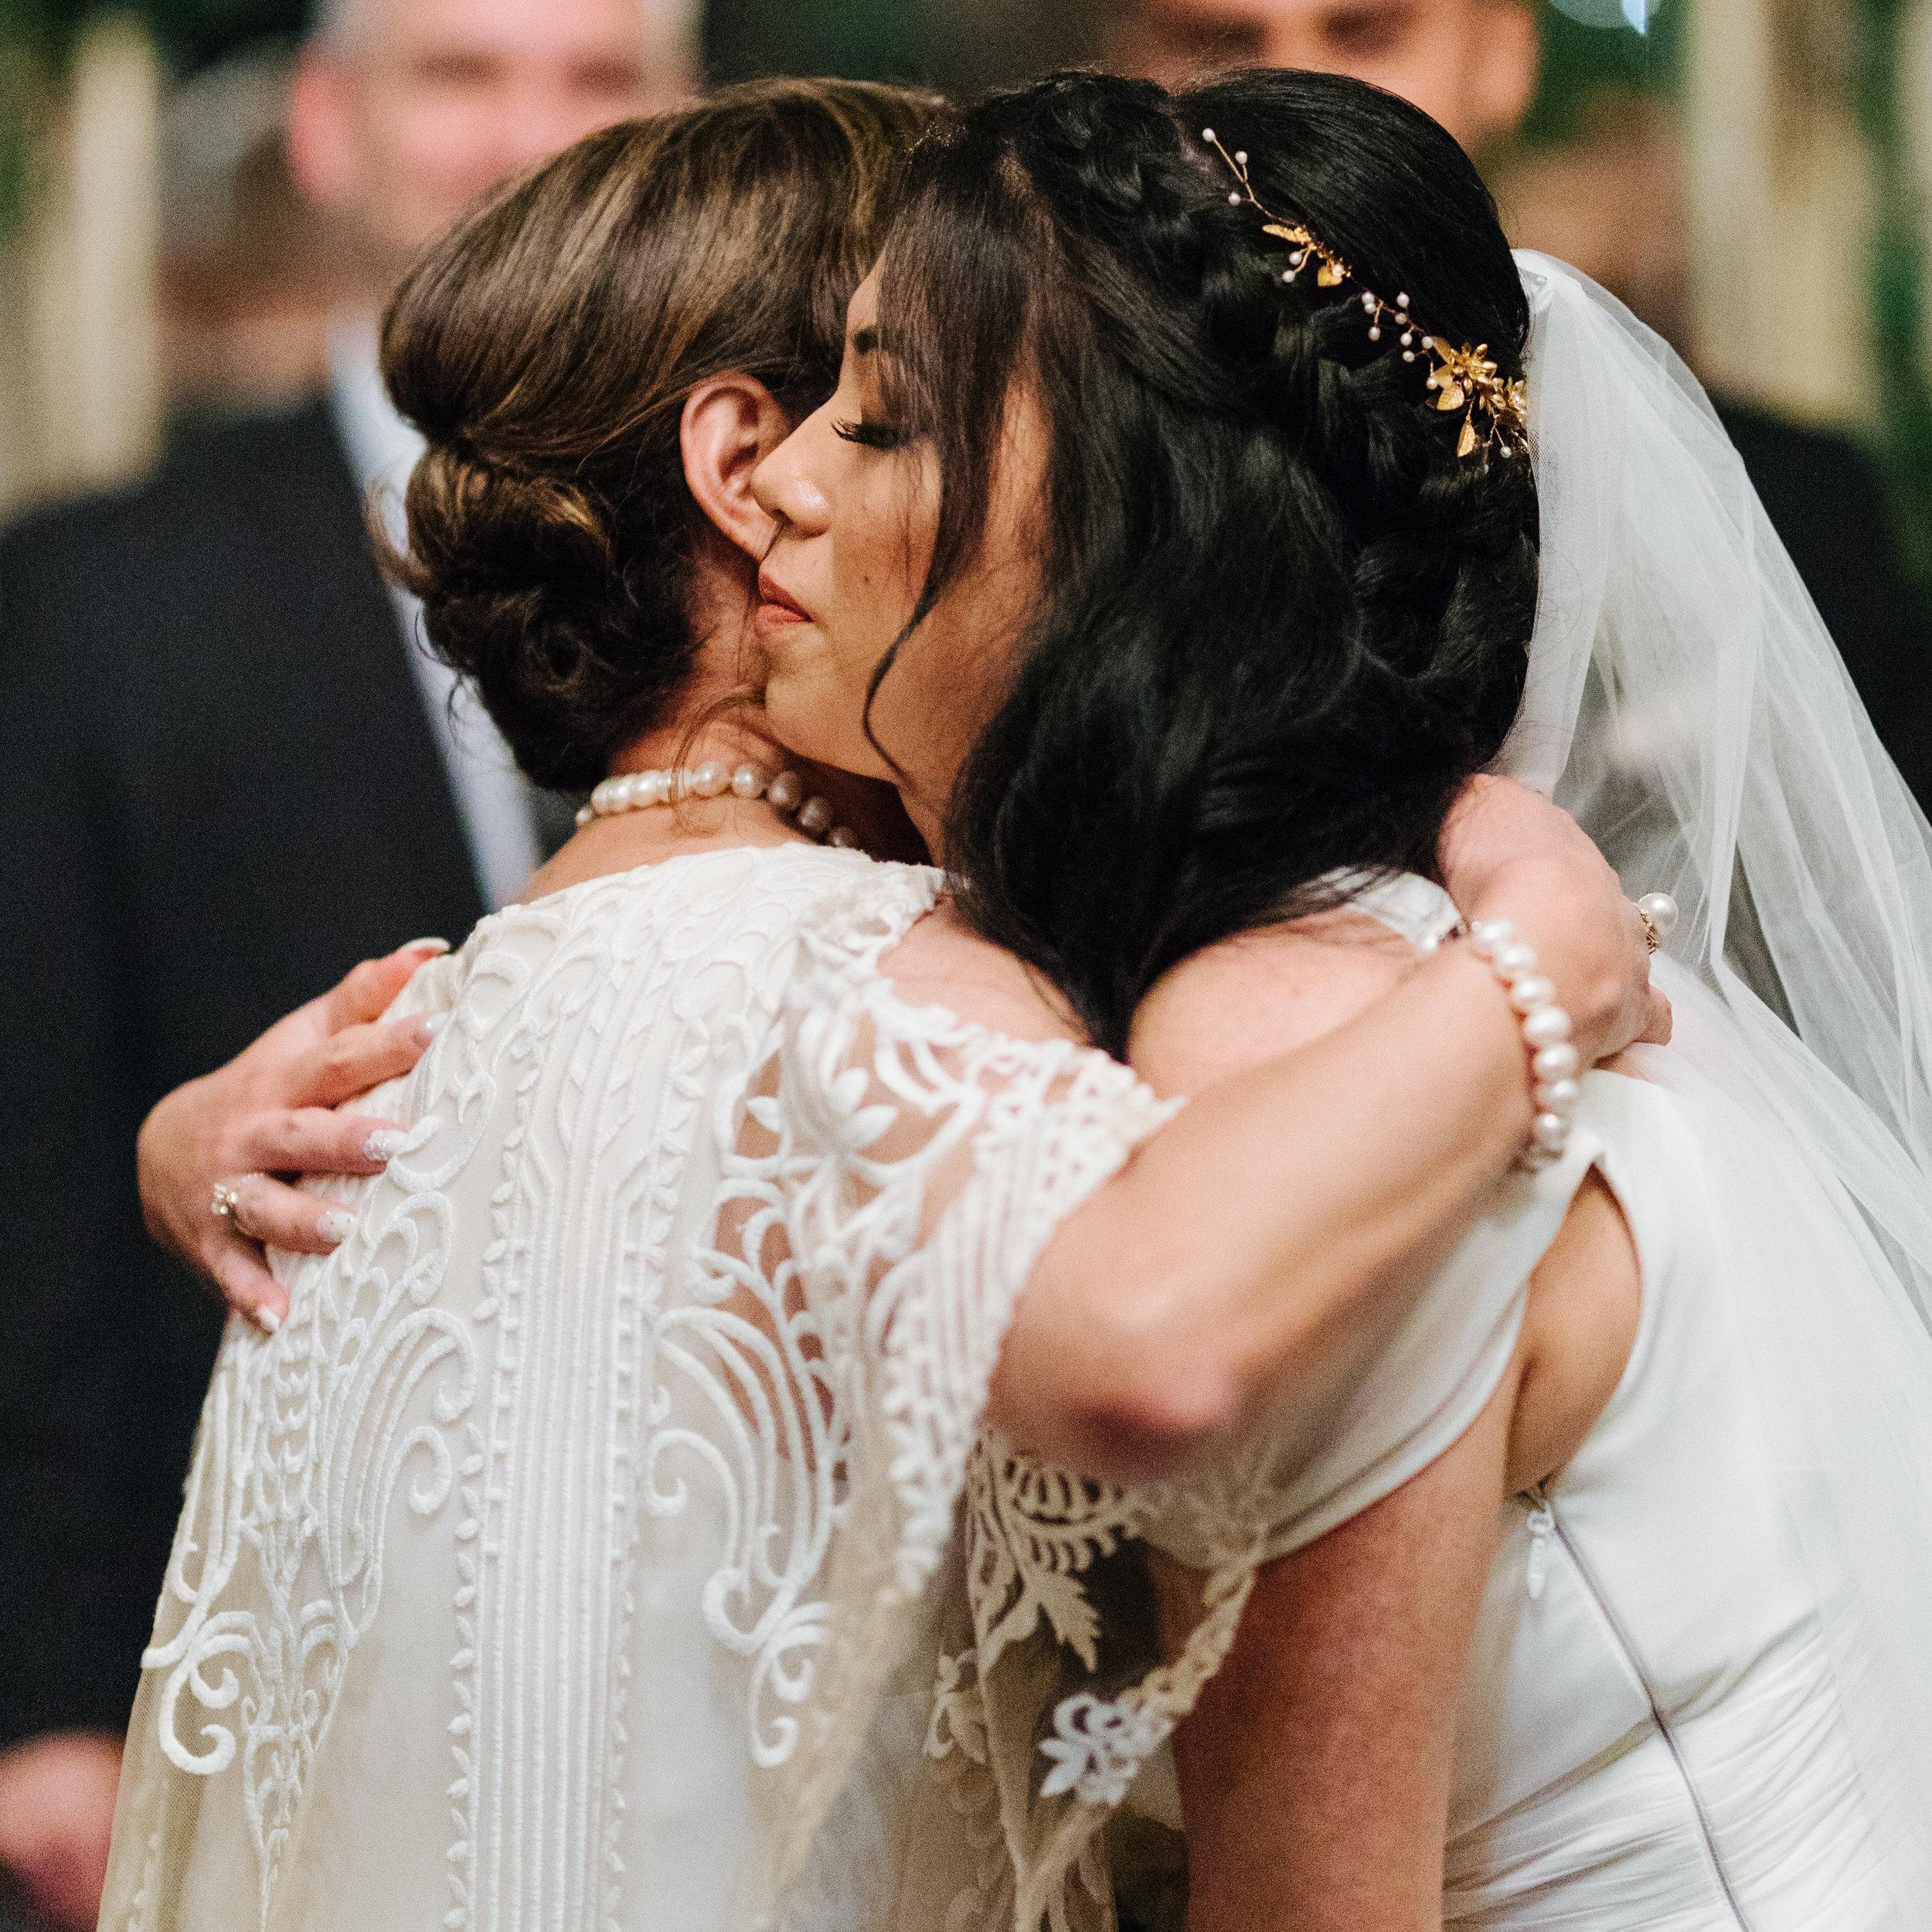 herastudios_wedding1_danica_sanjeev_collectors_package-174.jpg